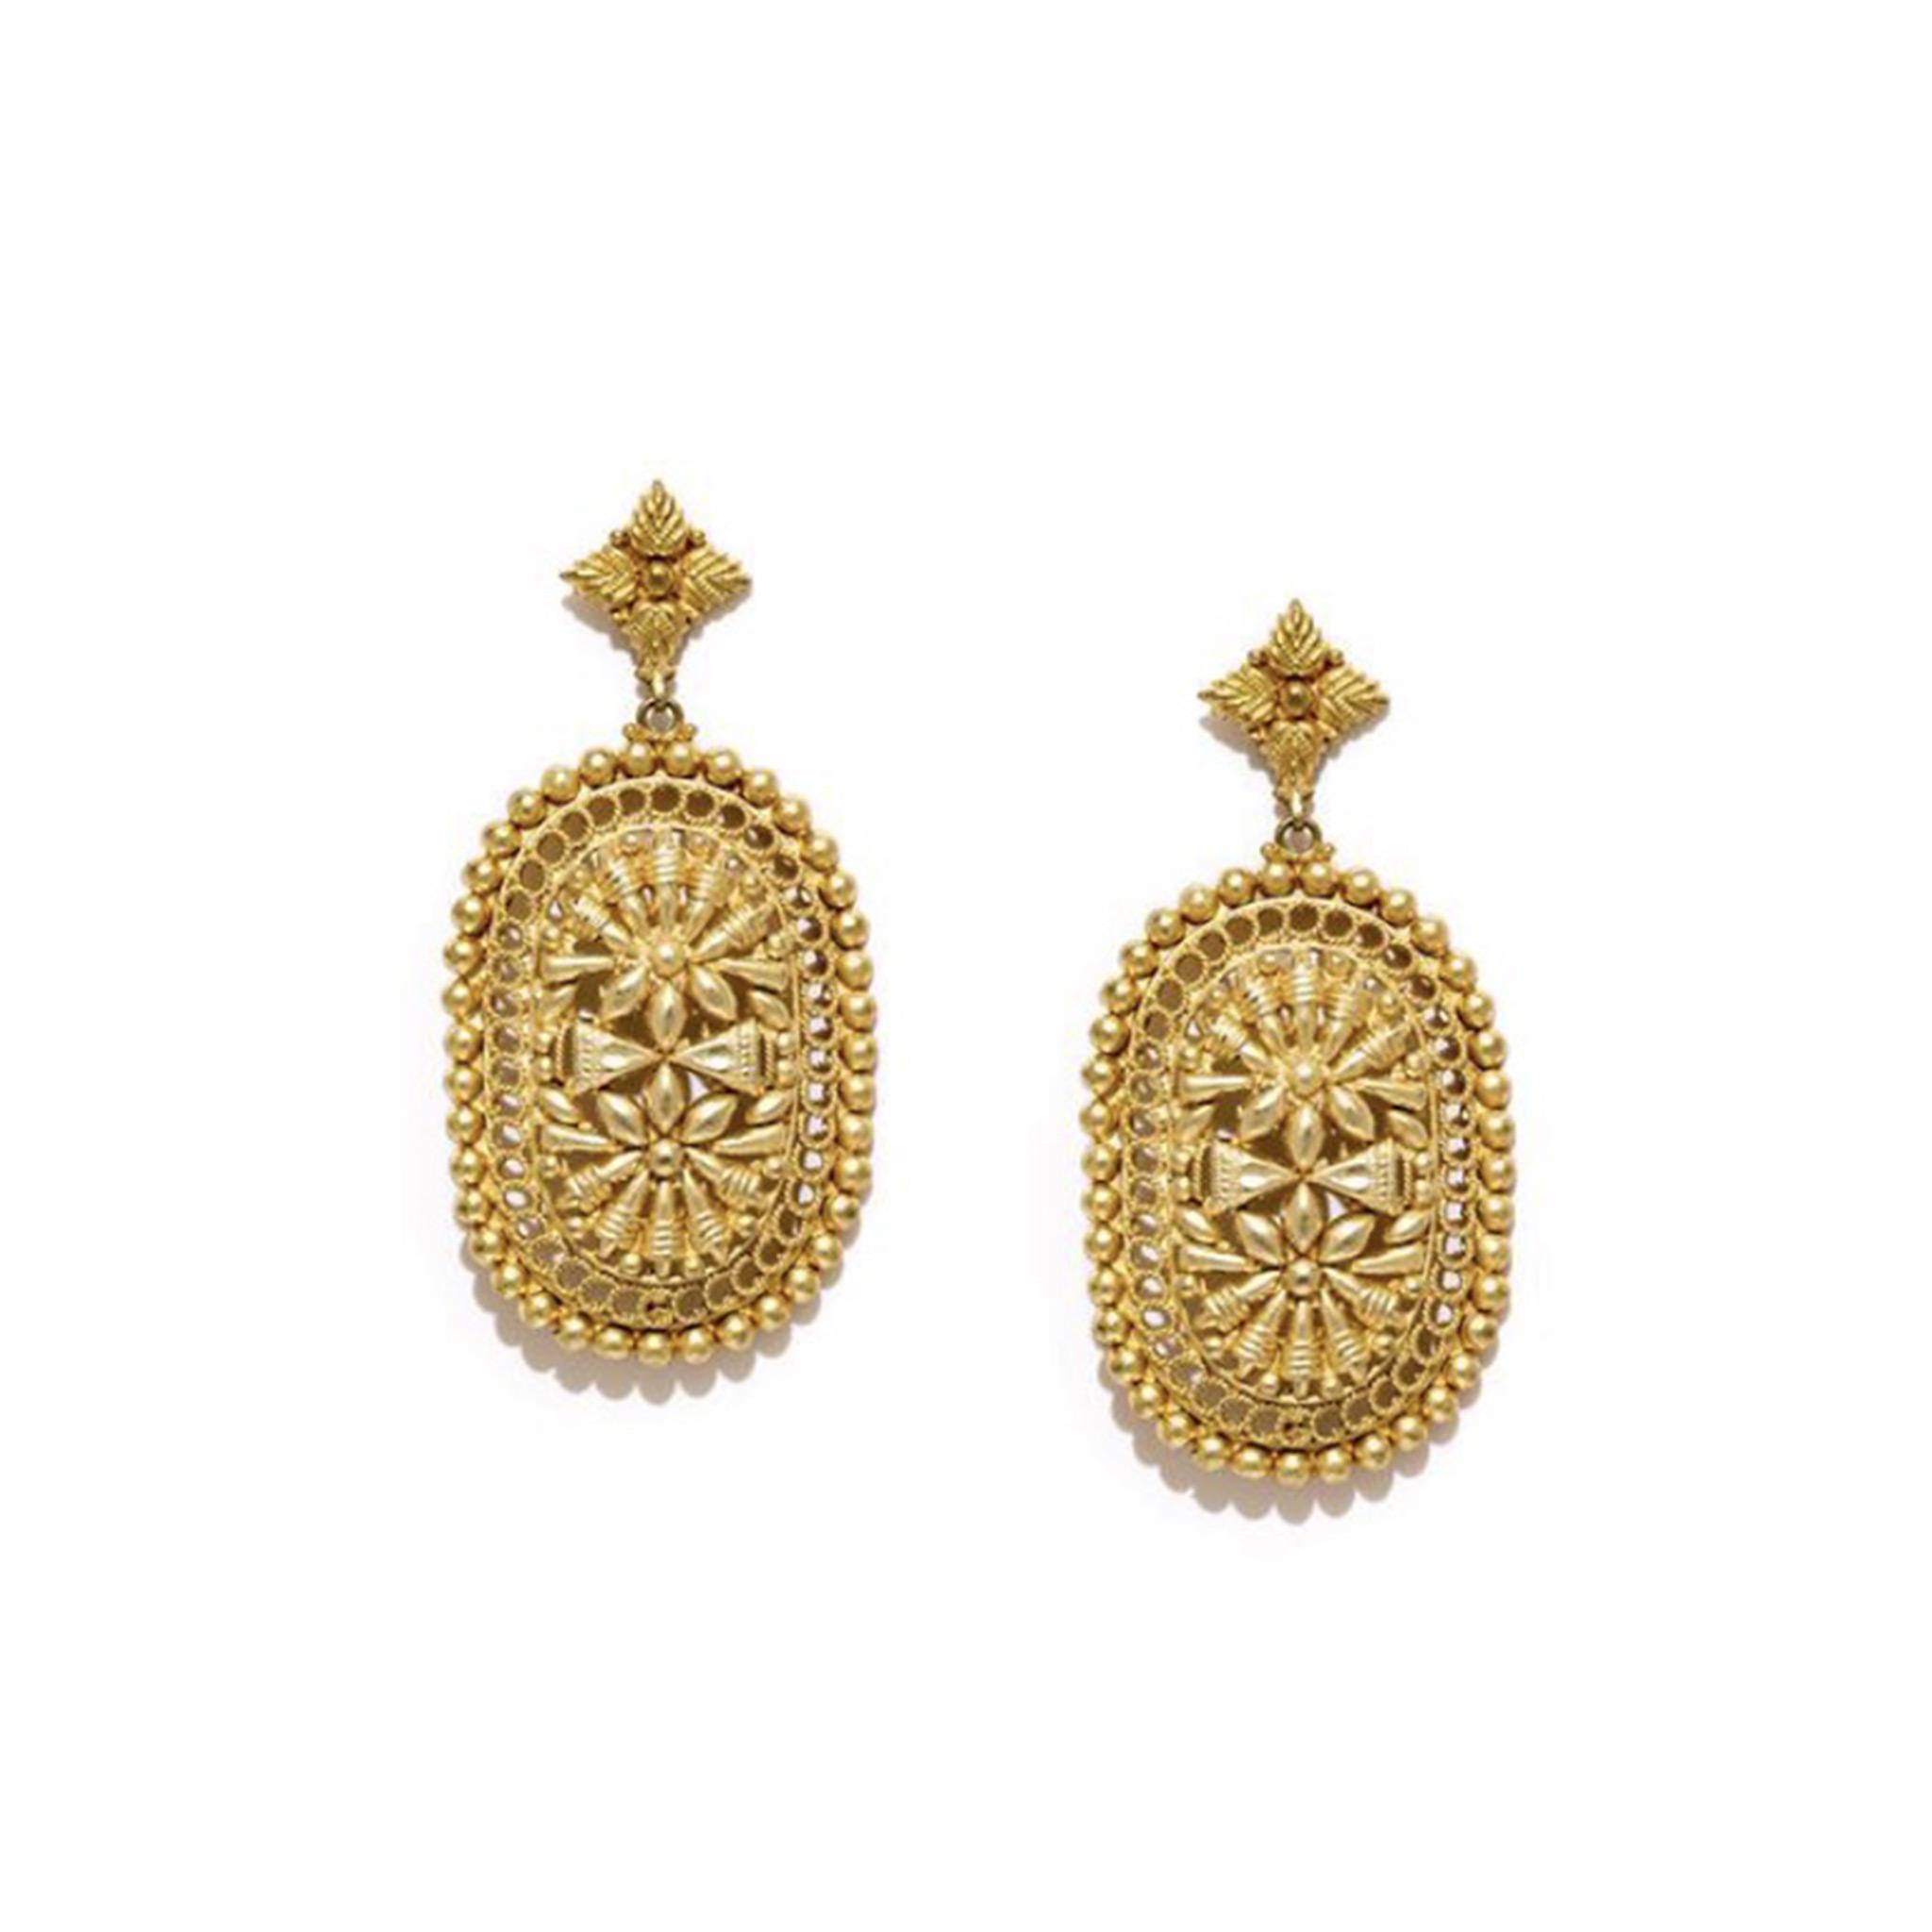 Valliyan Nitya Arora Gold Plated Mirza Designer Earrings